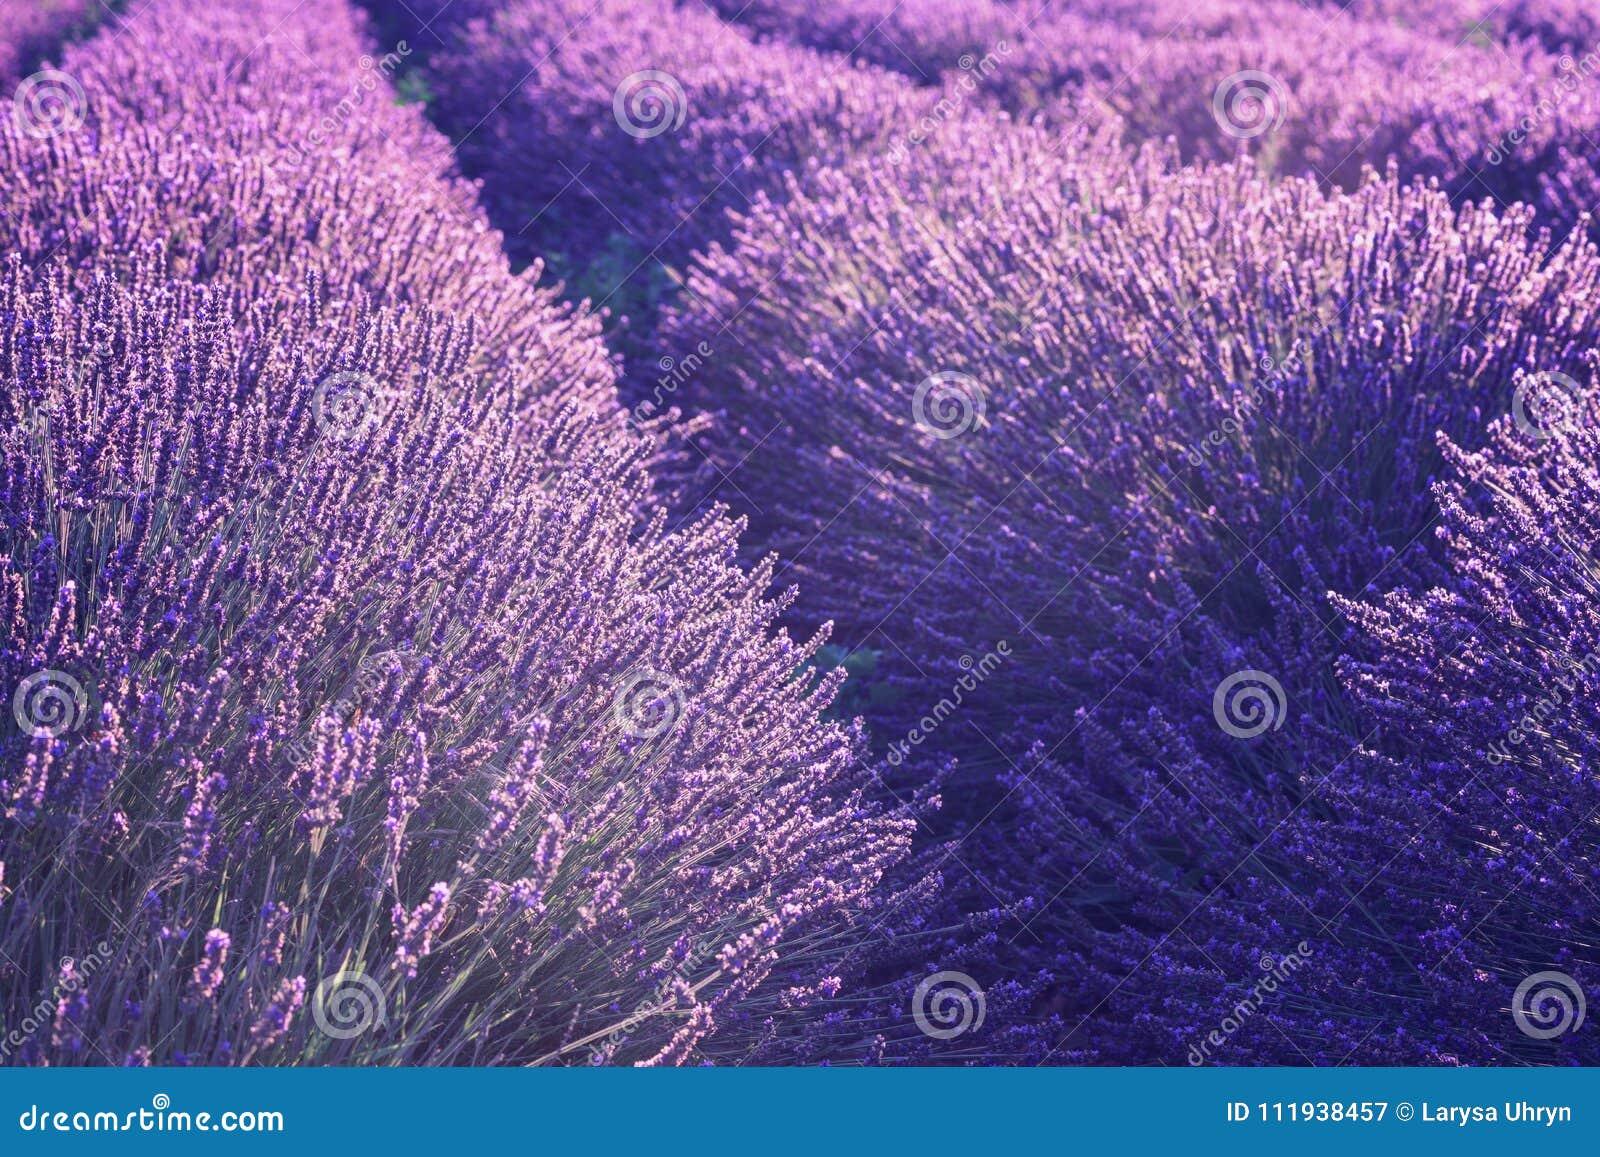 Natural floral lavender background, ultra violet concept - color of the year 2018